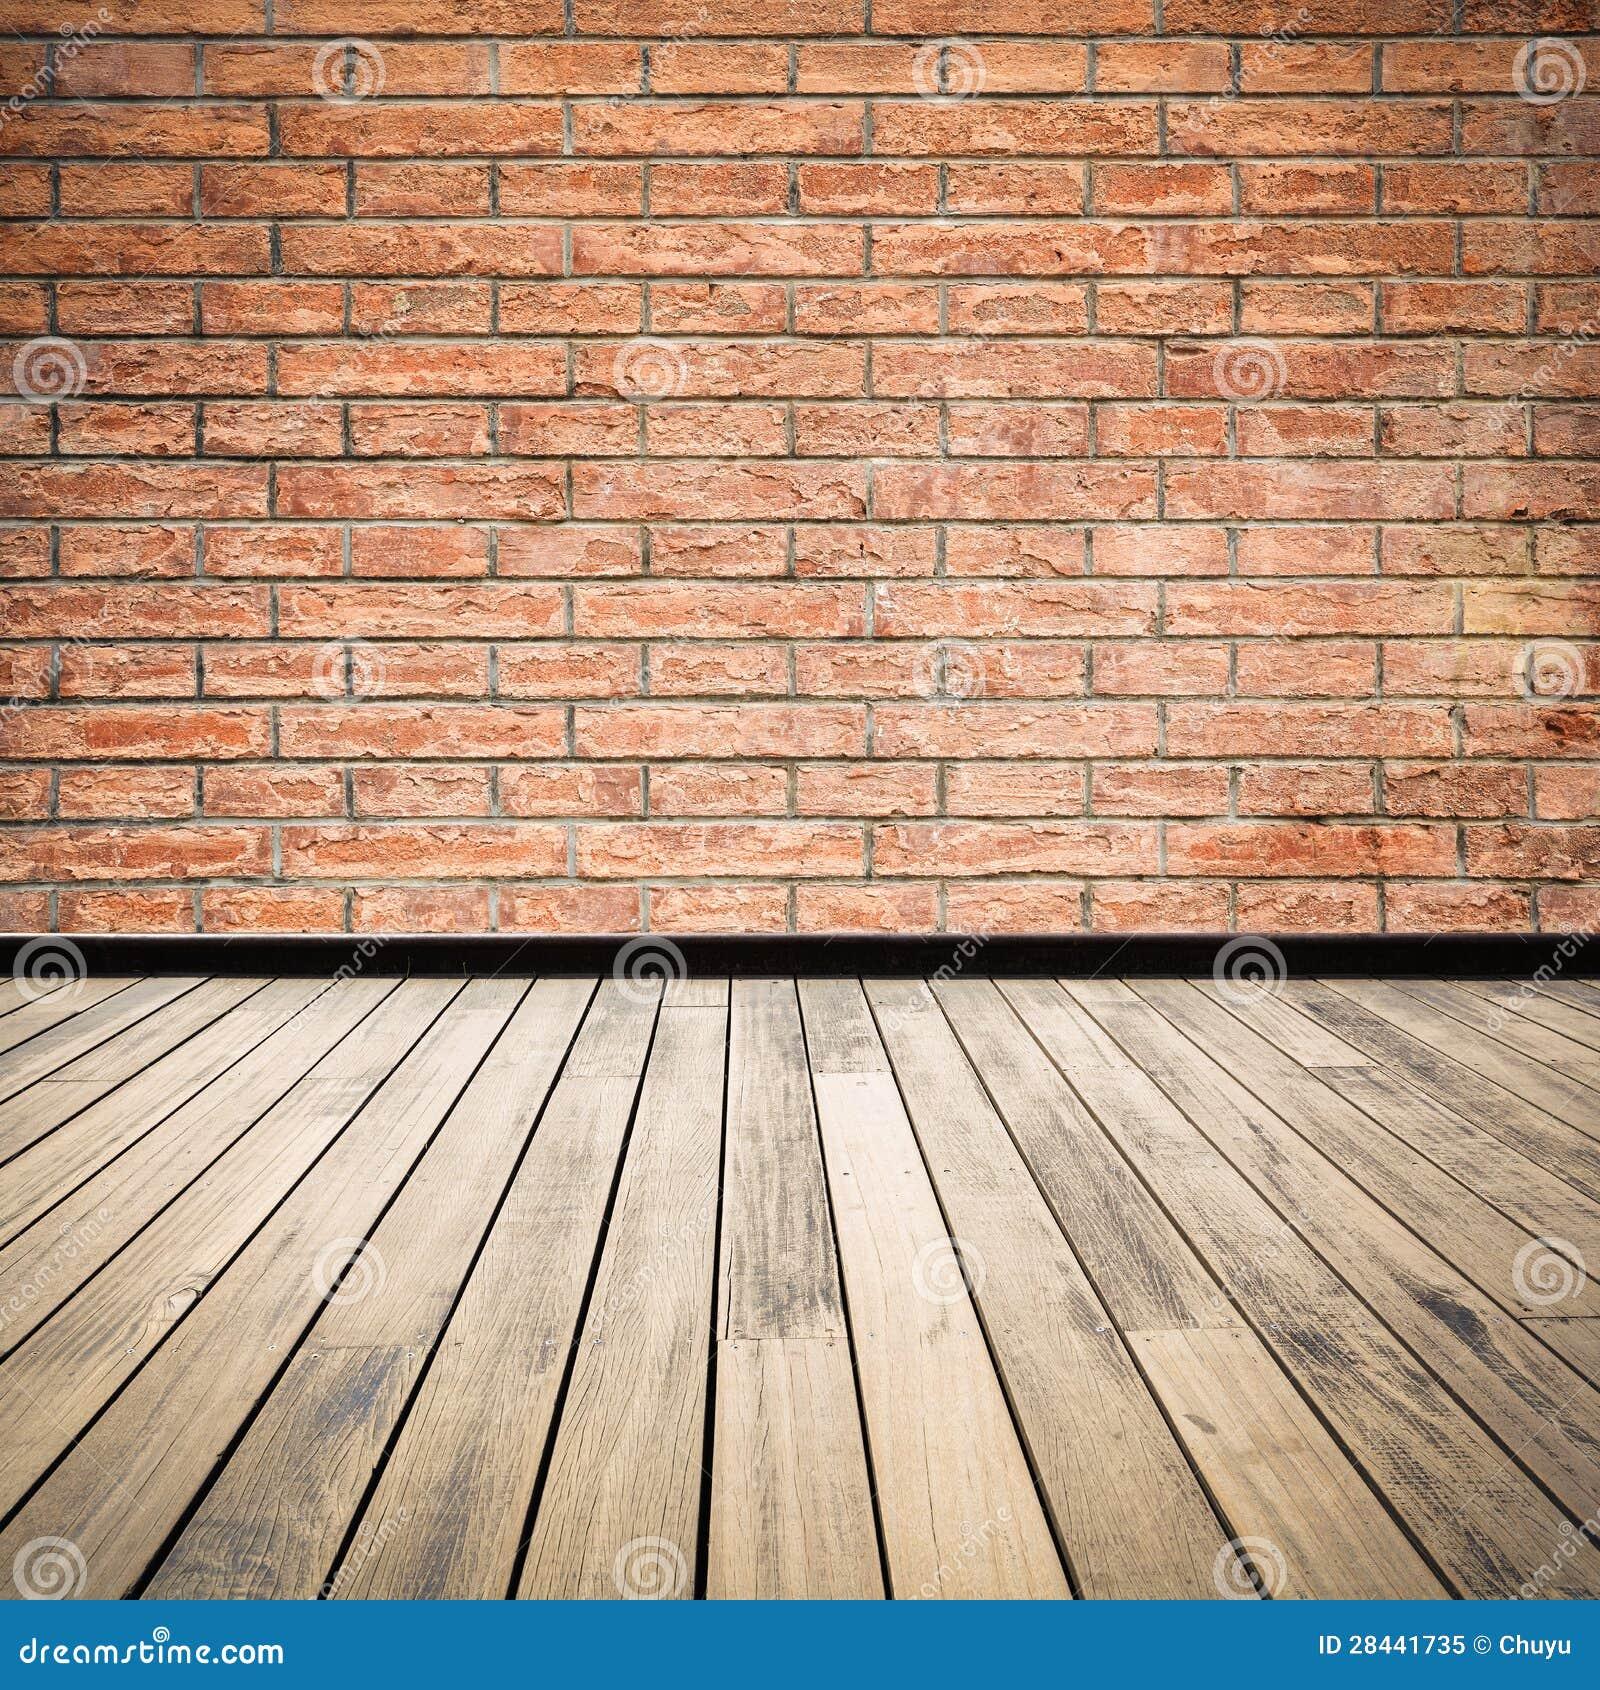 Z Brick Flooring : Brick wall and wooden floor royalty free stock photo